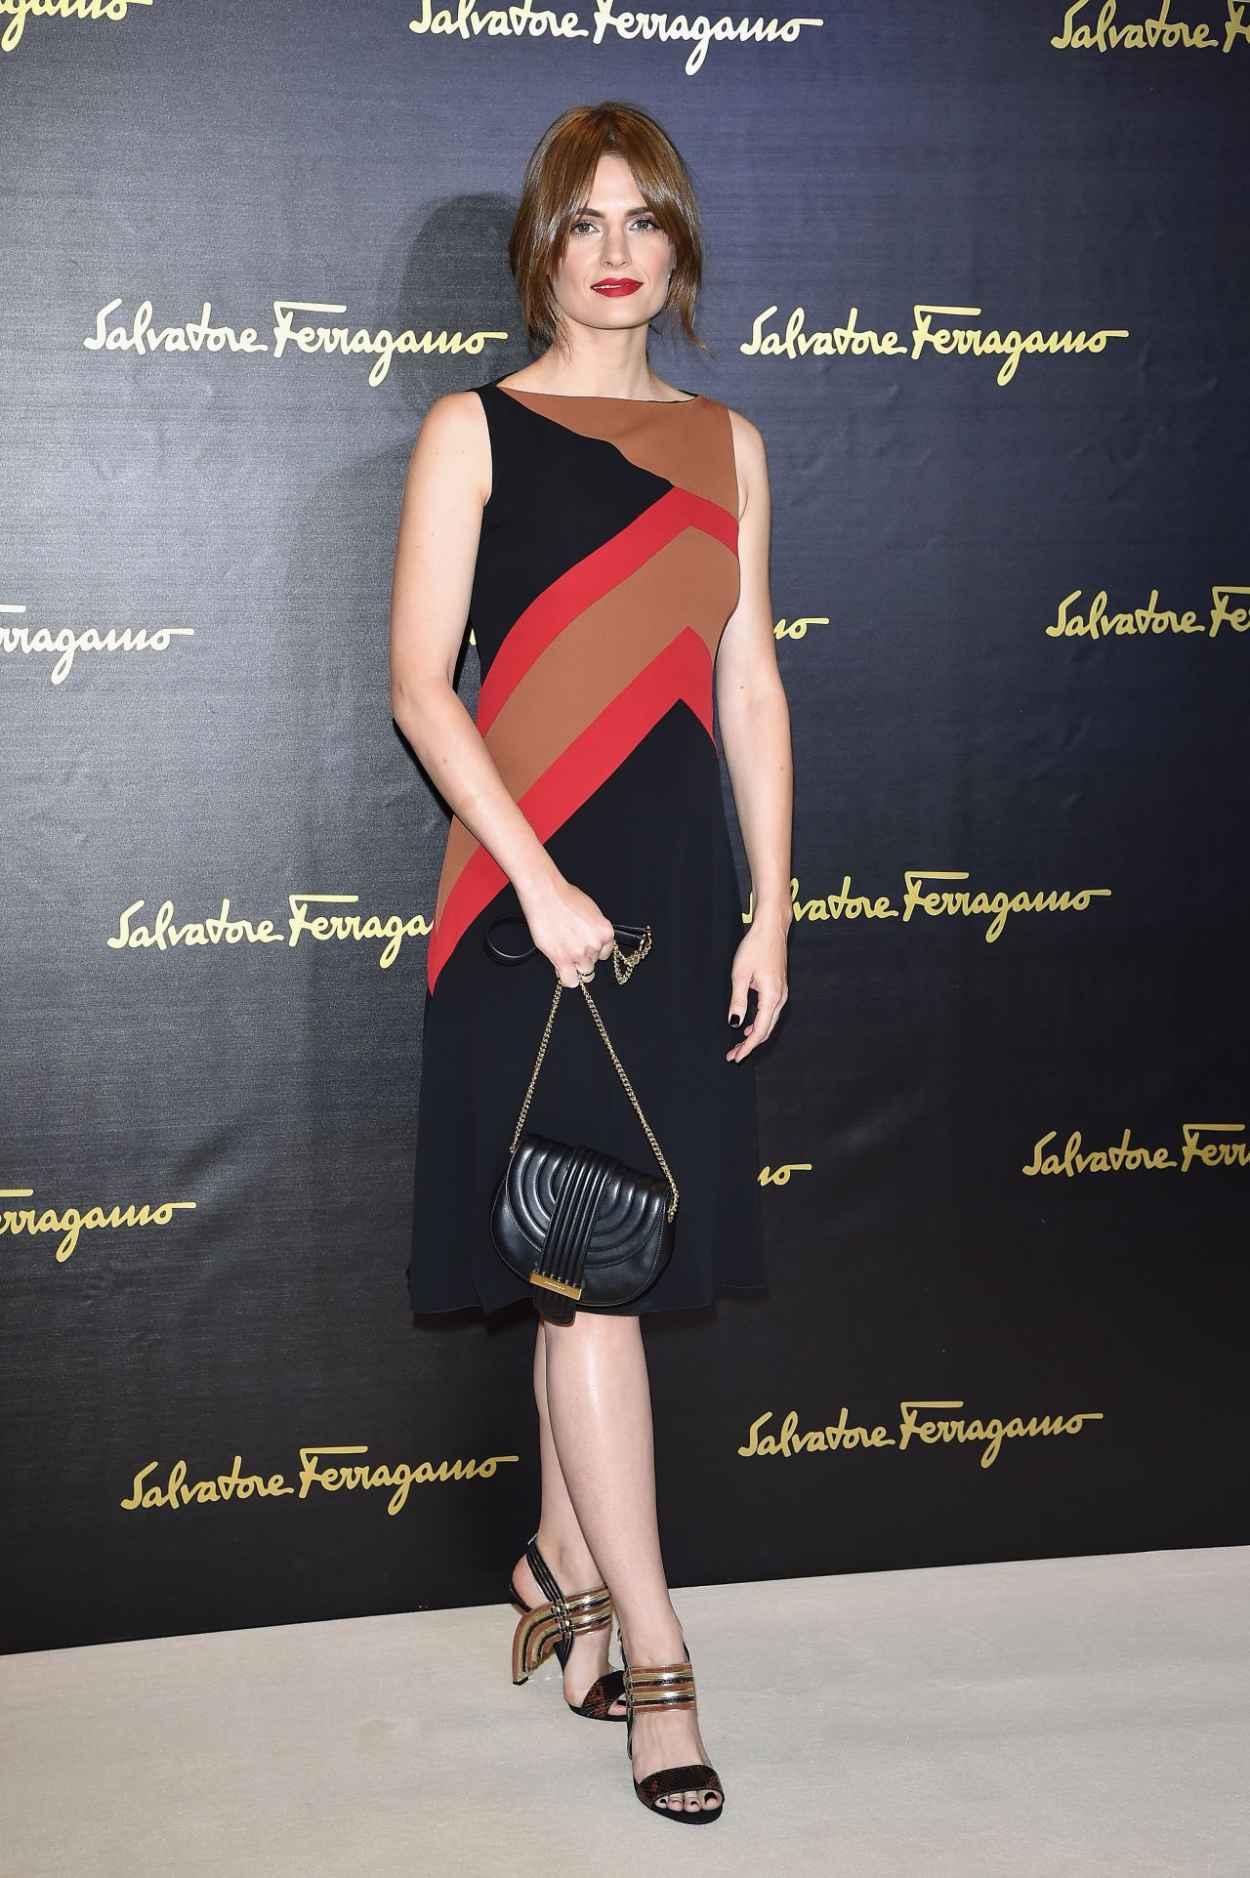 Stana Katic - Salvatore Ferragamo - Milan Fashion Week SS16-3